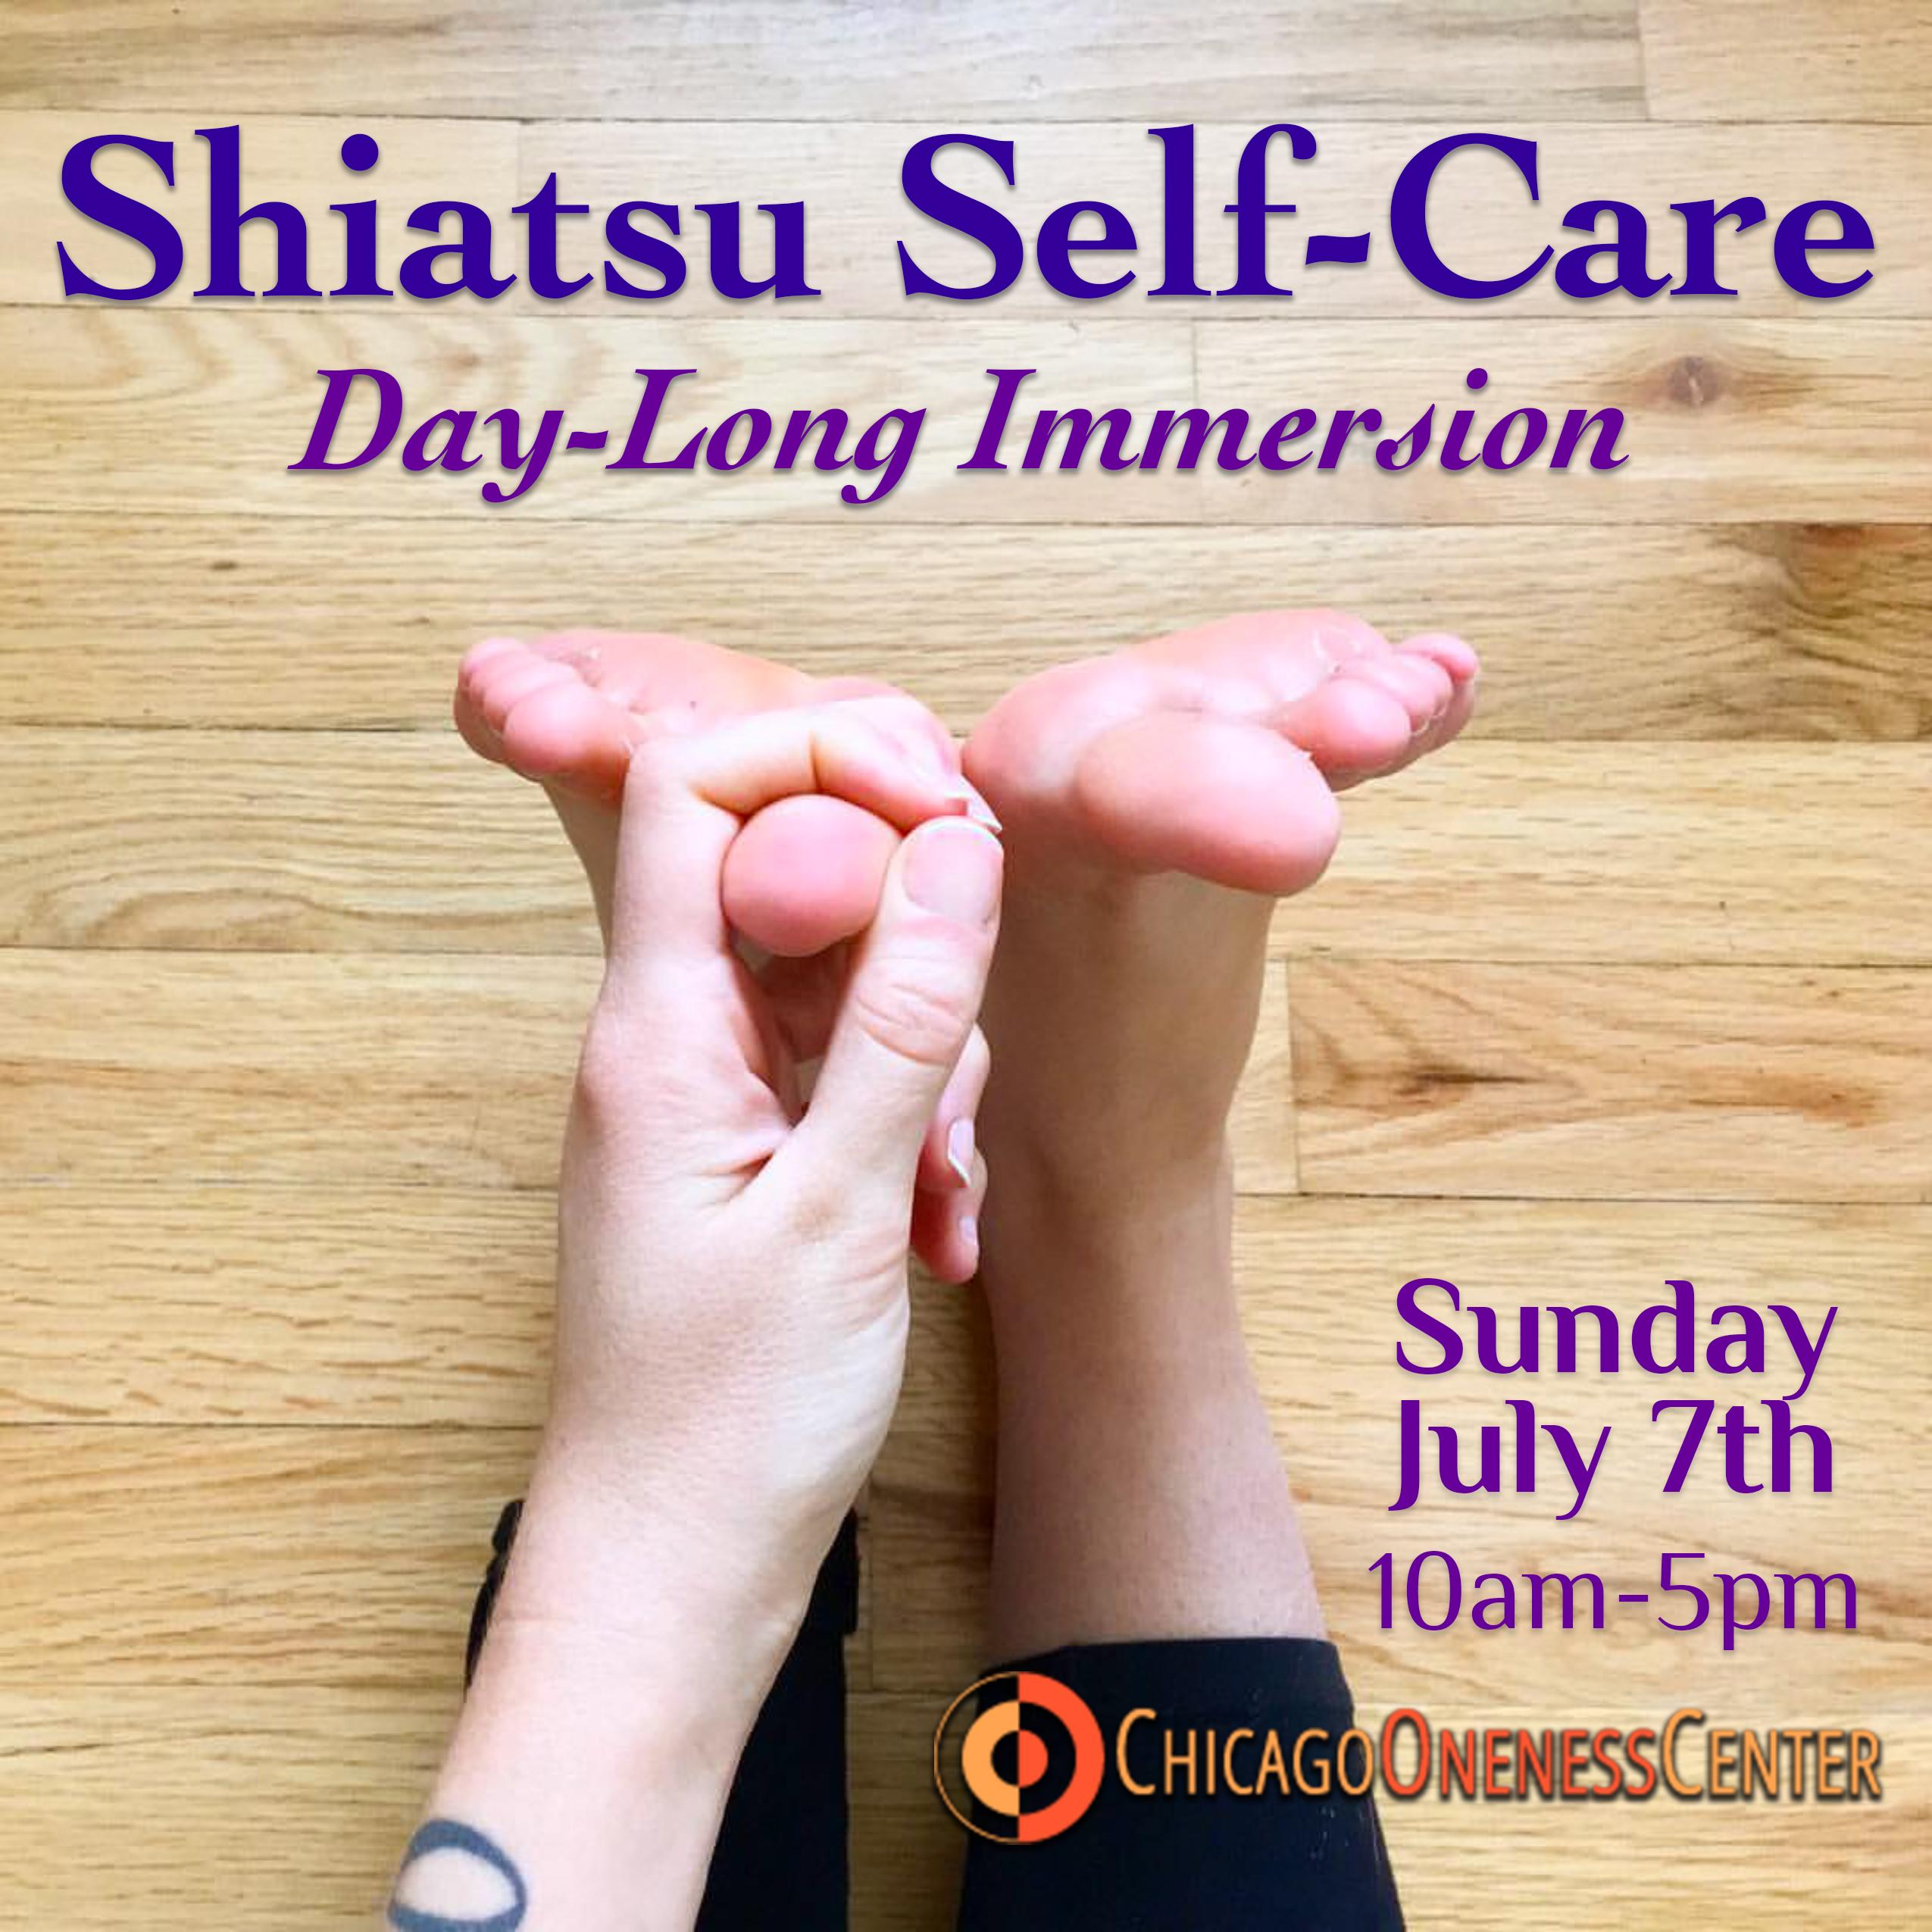 Shiatsu Self-Care Workshop